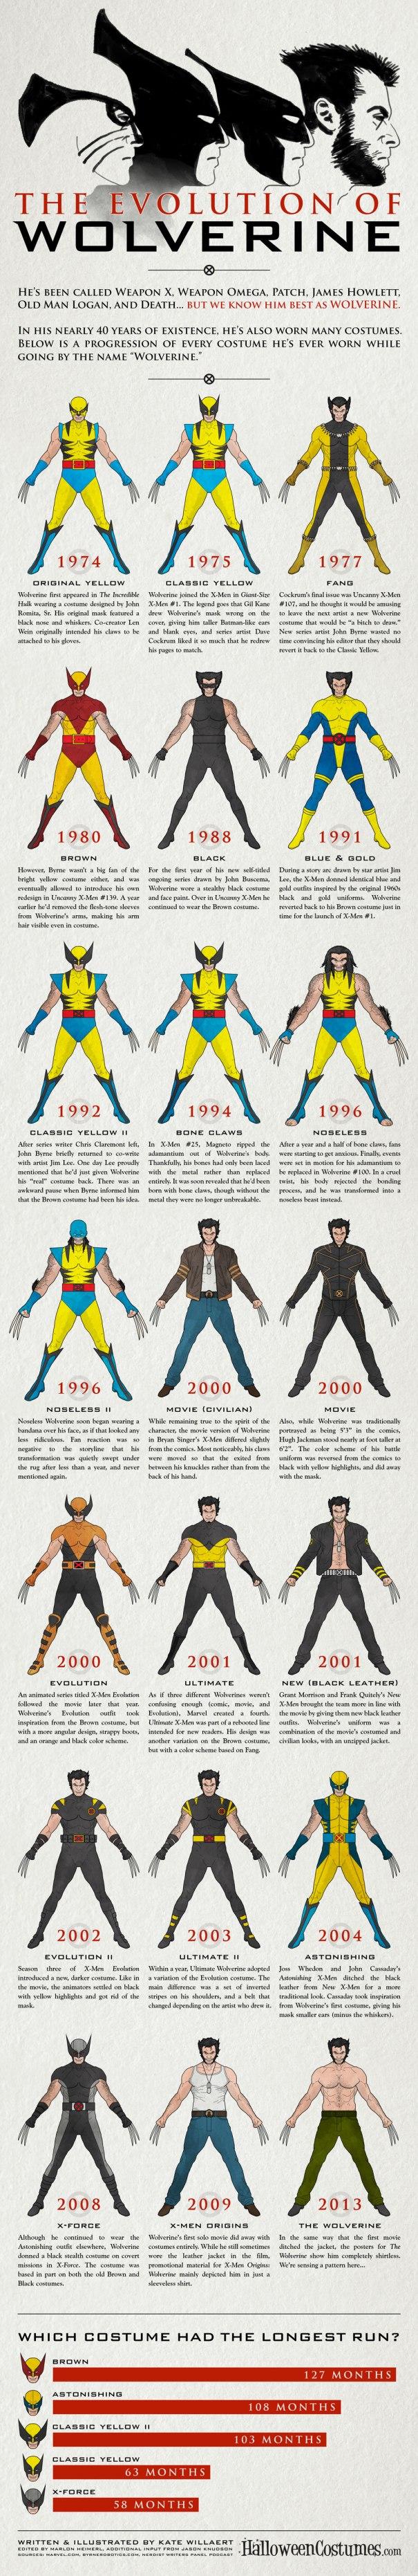 Evolution-of-Wolverine-Infographic-FULL